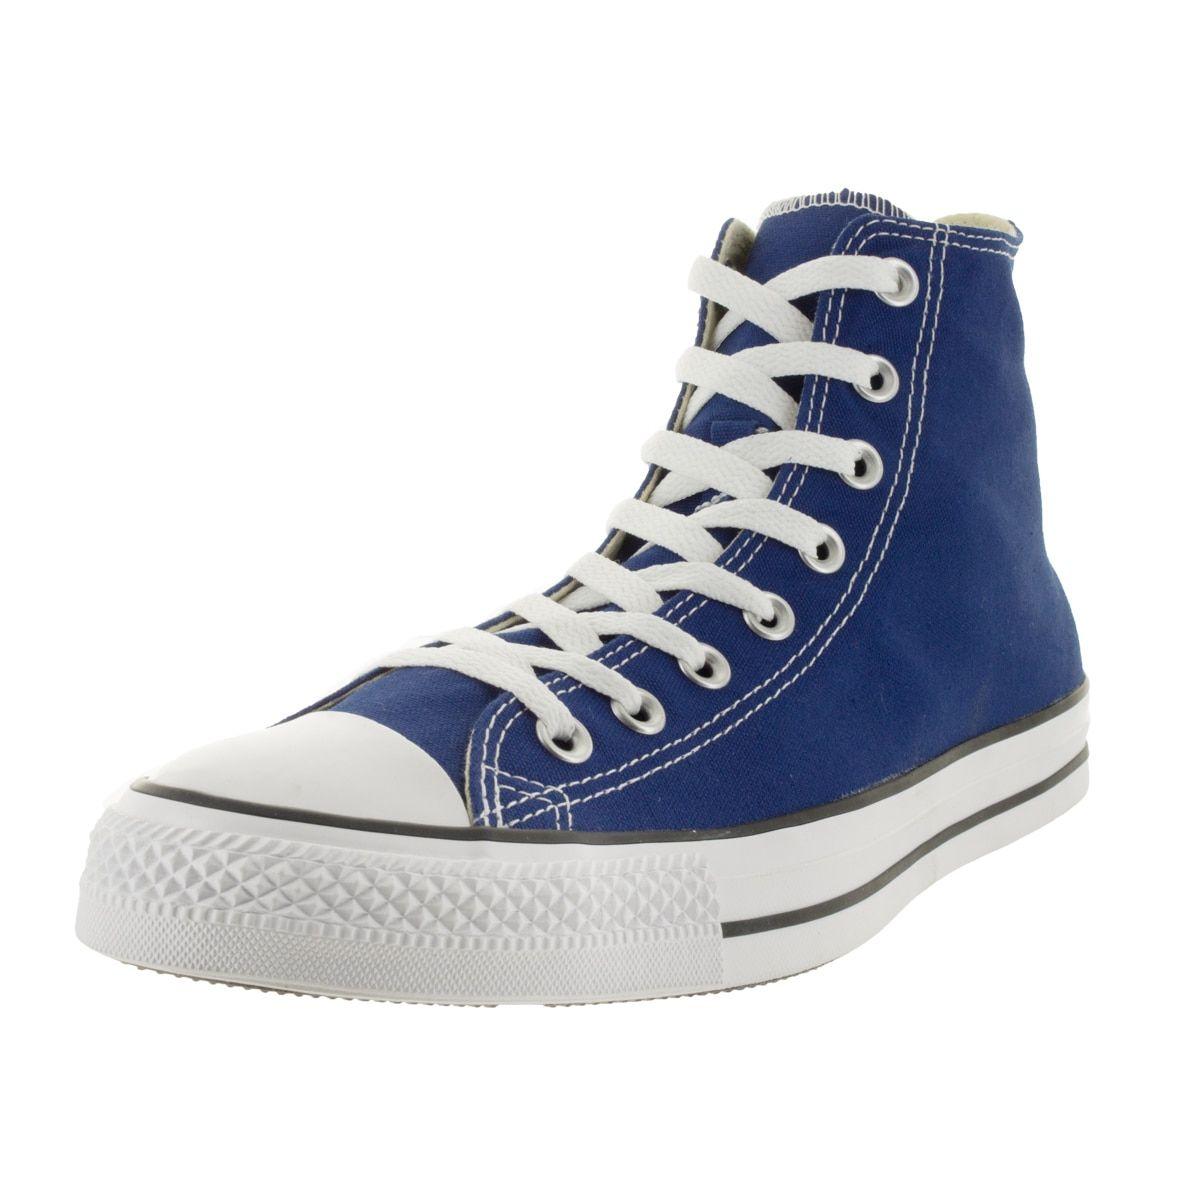 Chaussures Converse Chuck Taylor All Star HI Roadtrip tDm2K